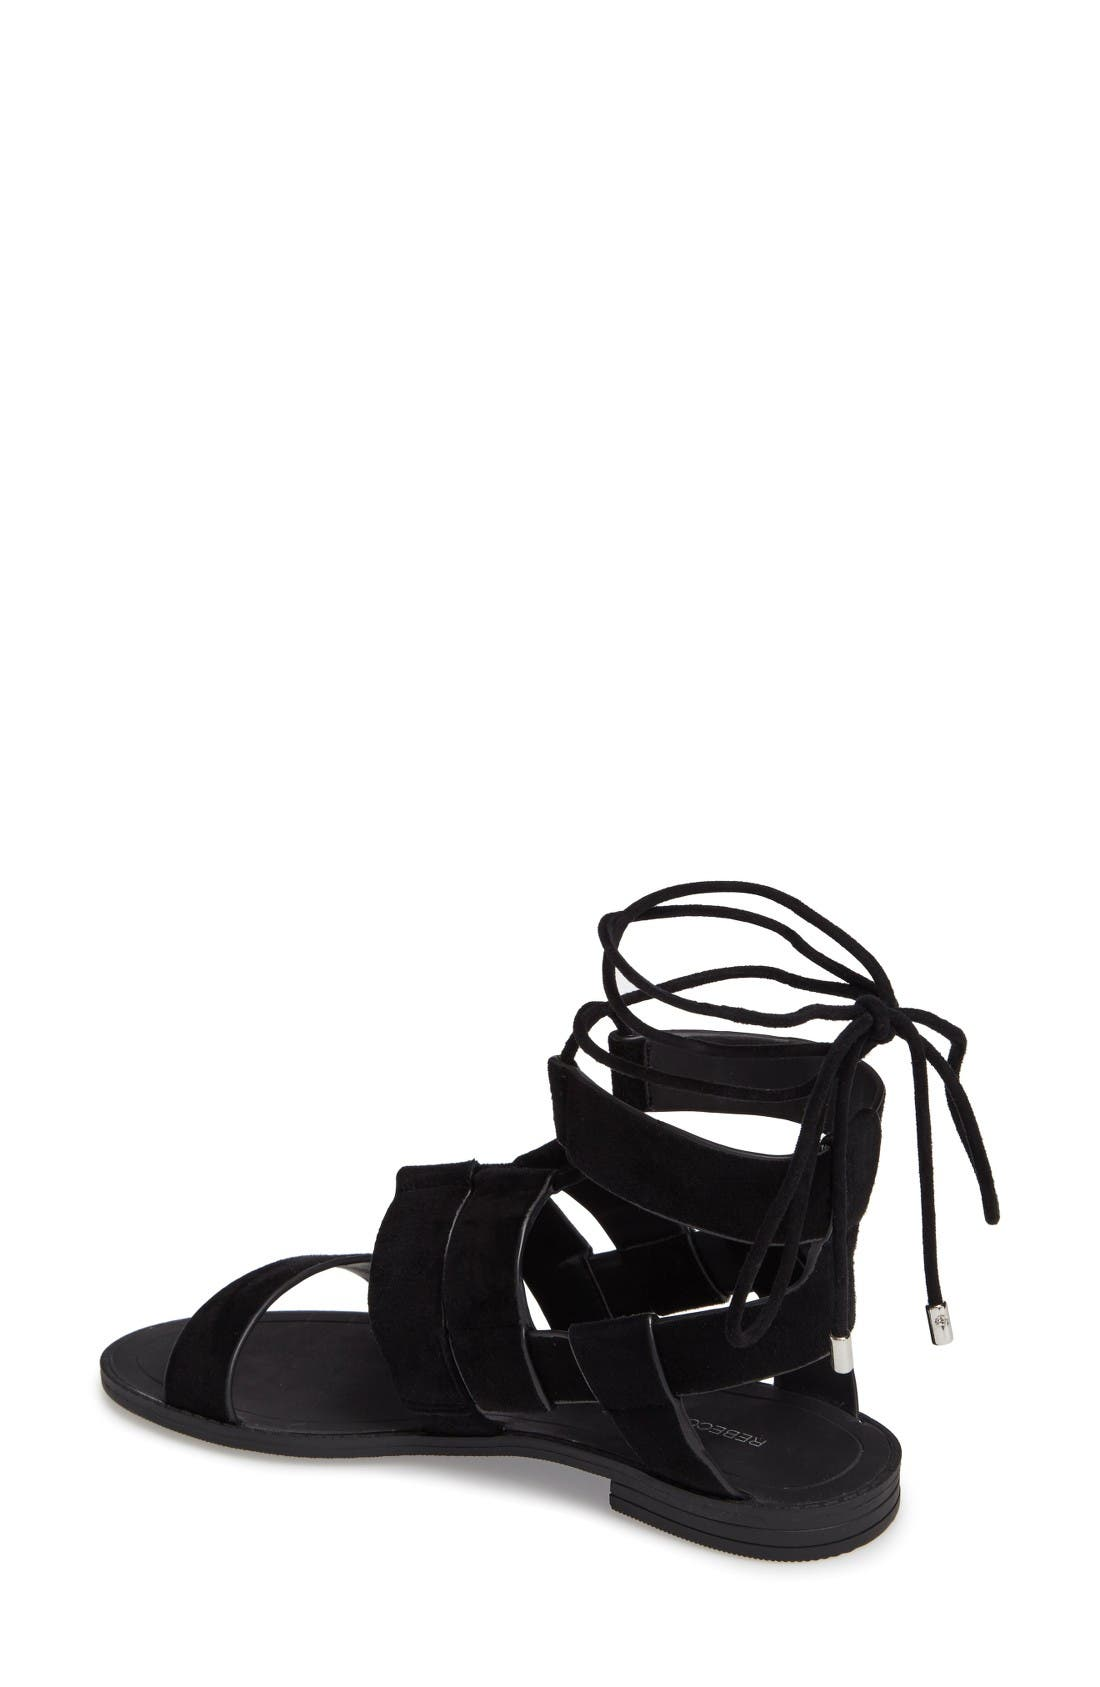 Alternate Image 2  - Rebecca Minkoff Giada Strappy Sandal (Women)